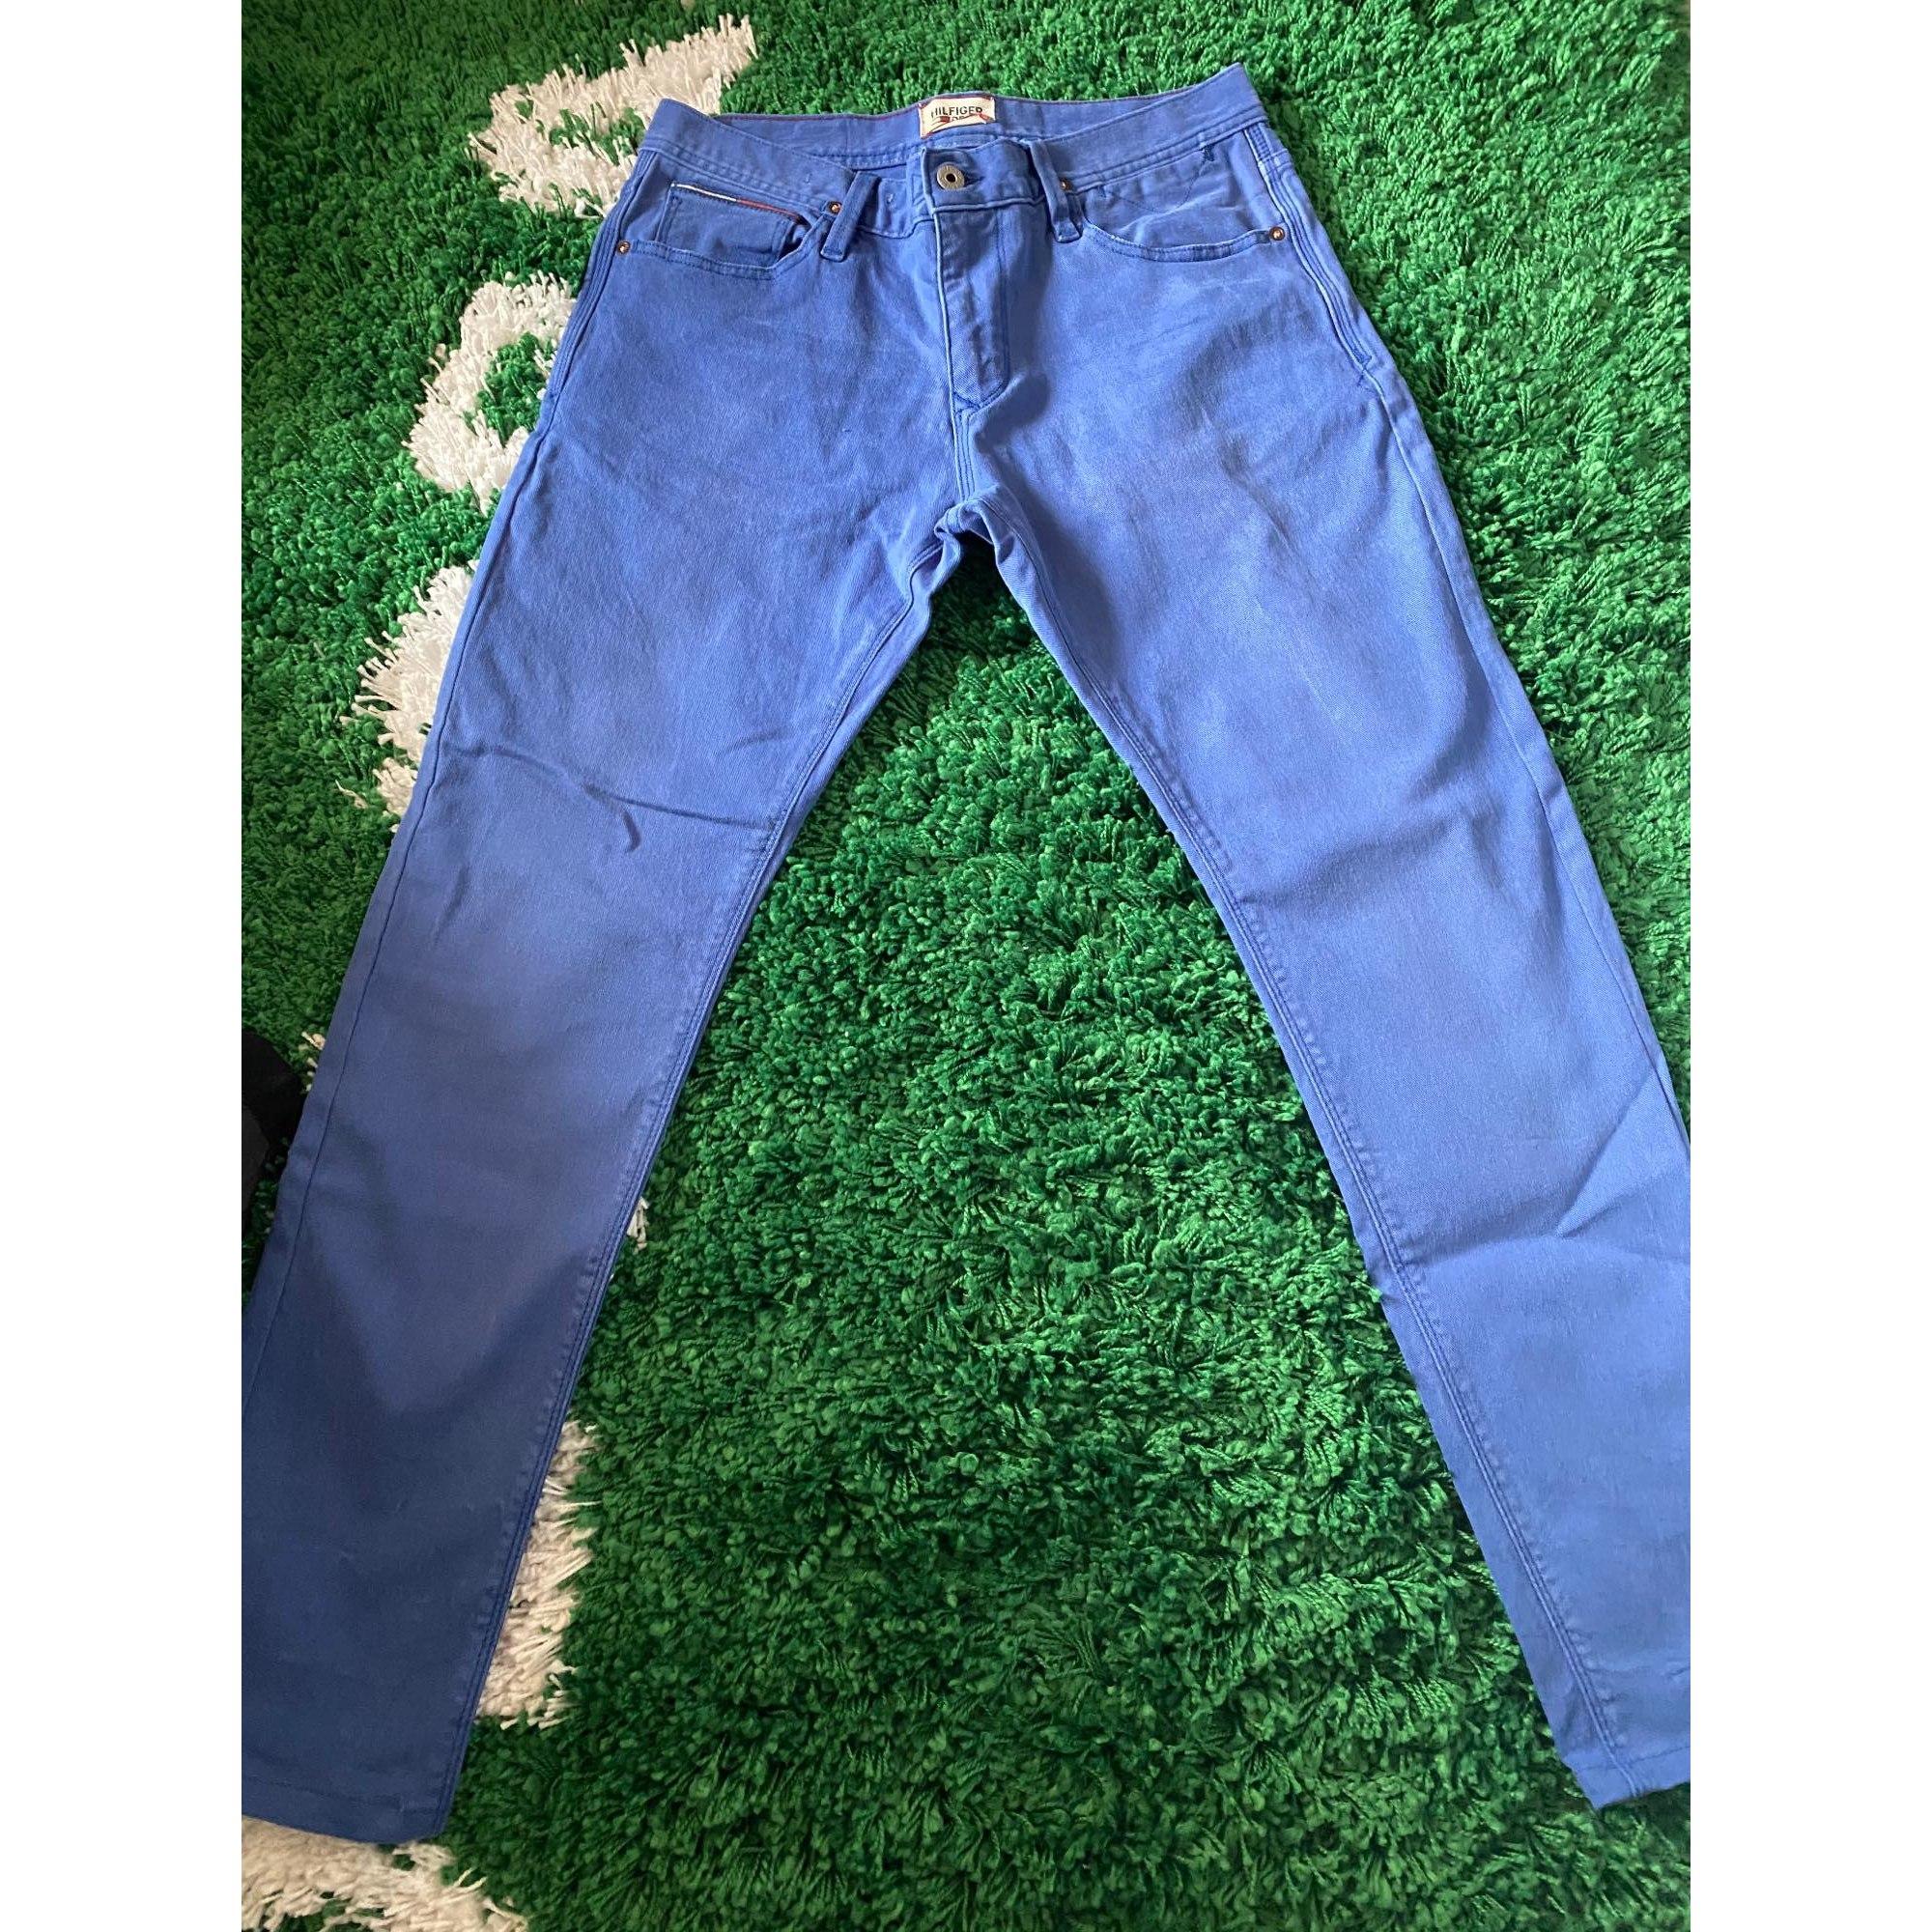 Pantalon slim TOMMY HILFIGER Bleu, bleu marine, bleu turquoise